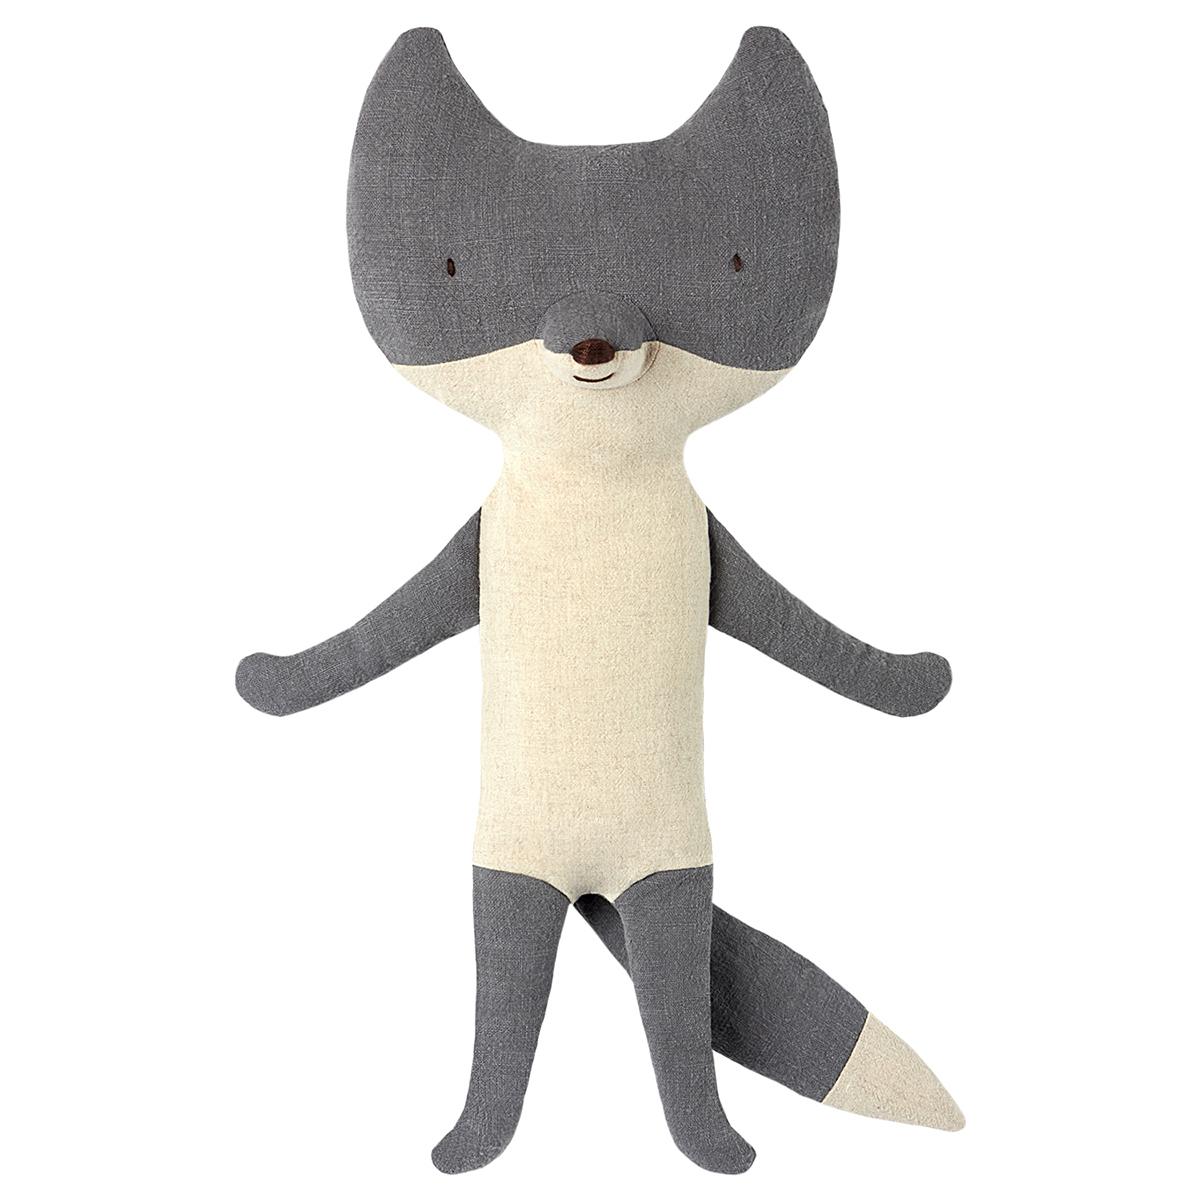 Peluche Peluche Renard Silver Fox 45 cm Peluche Renard Silver Fox 45 cm